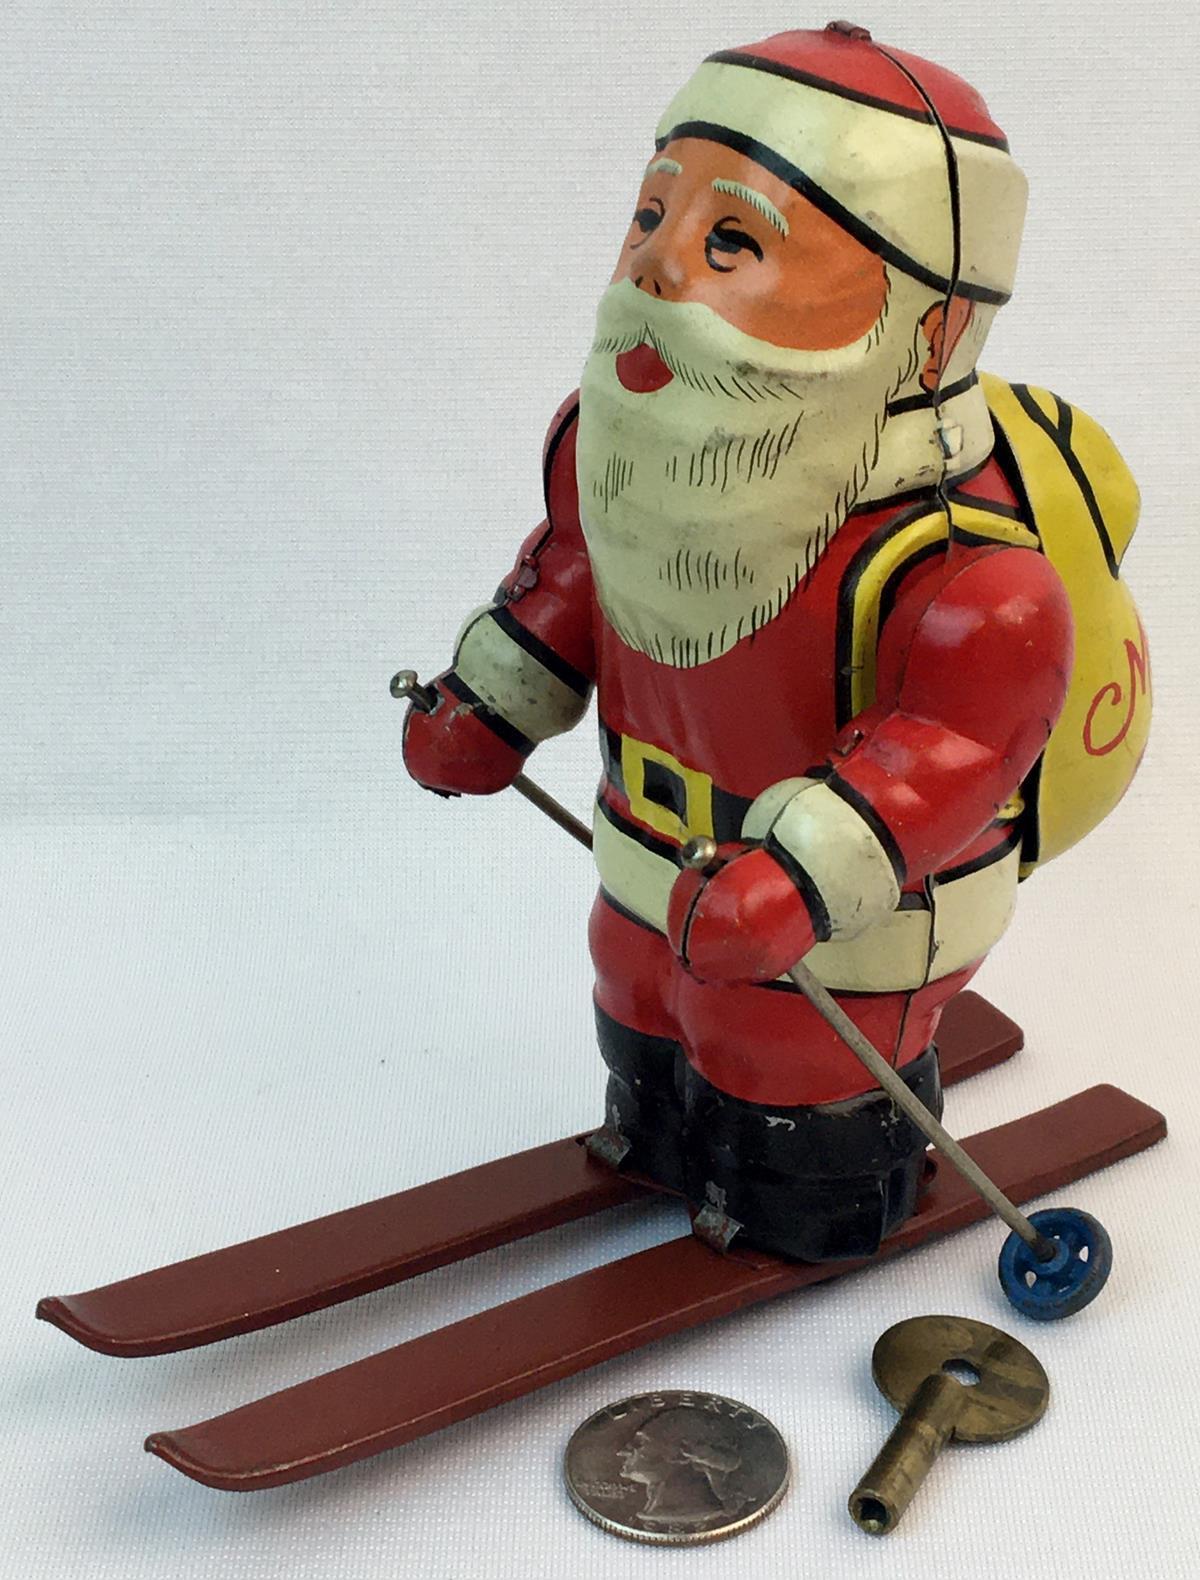 Vintage 1940's Tin Litho Wind Up Skiing Santa Claus by KSK Japan